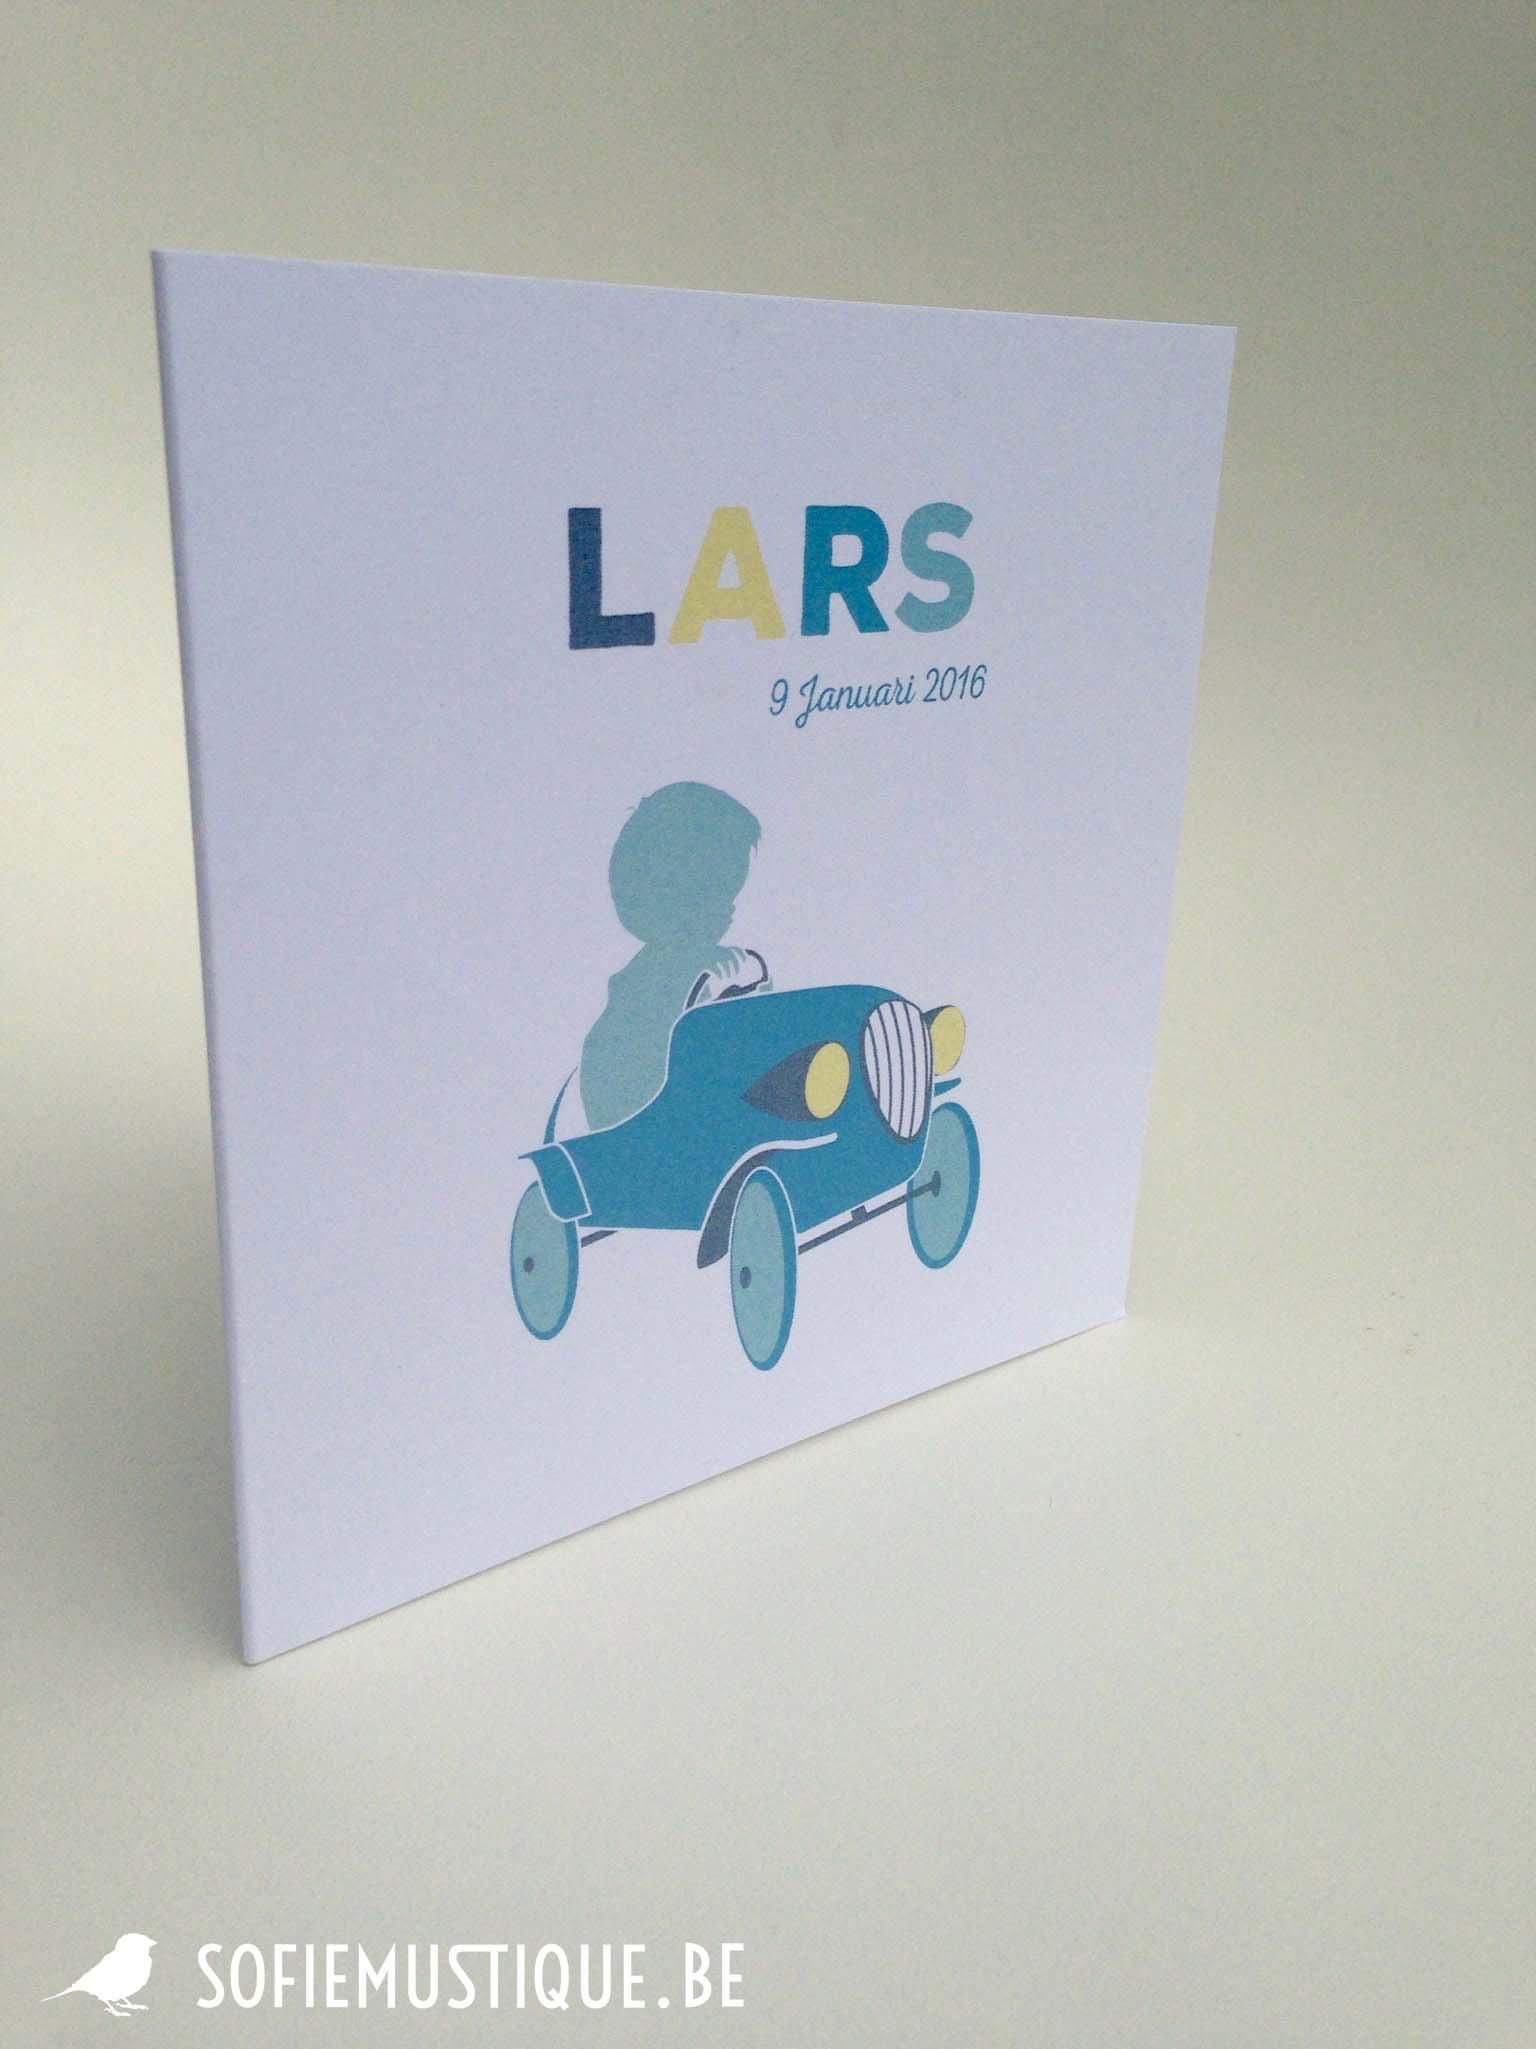 Geboortekaartje Lars   auto, vintage, blauw, silhouette, retro